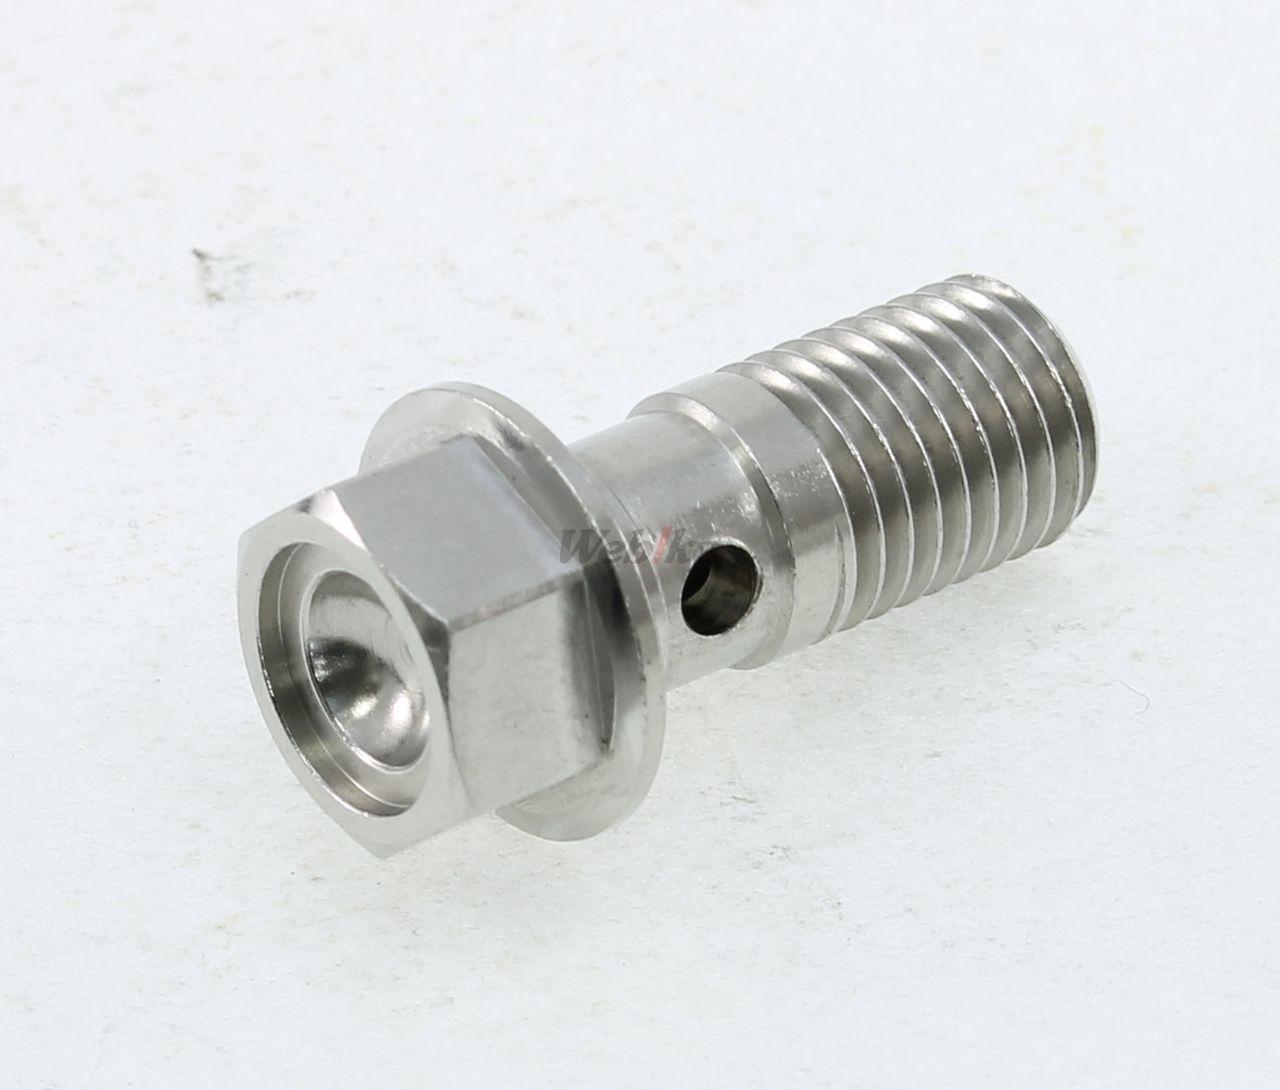 【KITACO】空芯螺絲(短)不鏽鋼 - 「Webike-摩托百貨」